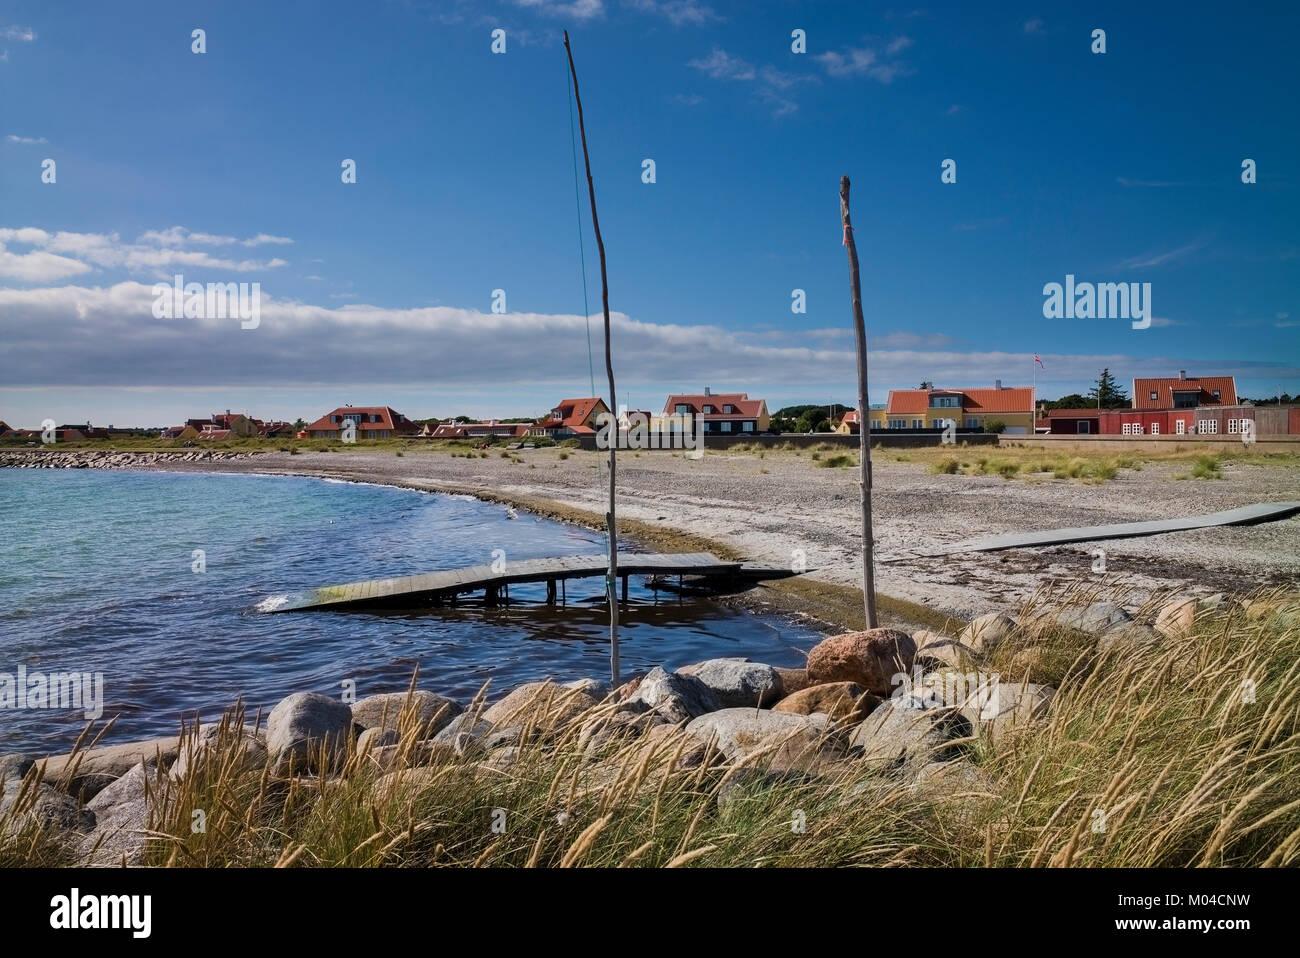 beach and wooden jetty on coast near Skagen Denmark - Stock Image